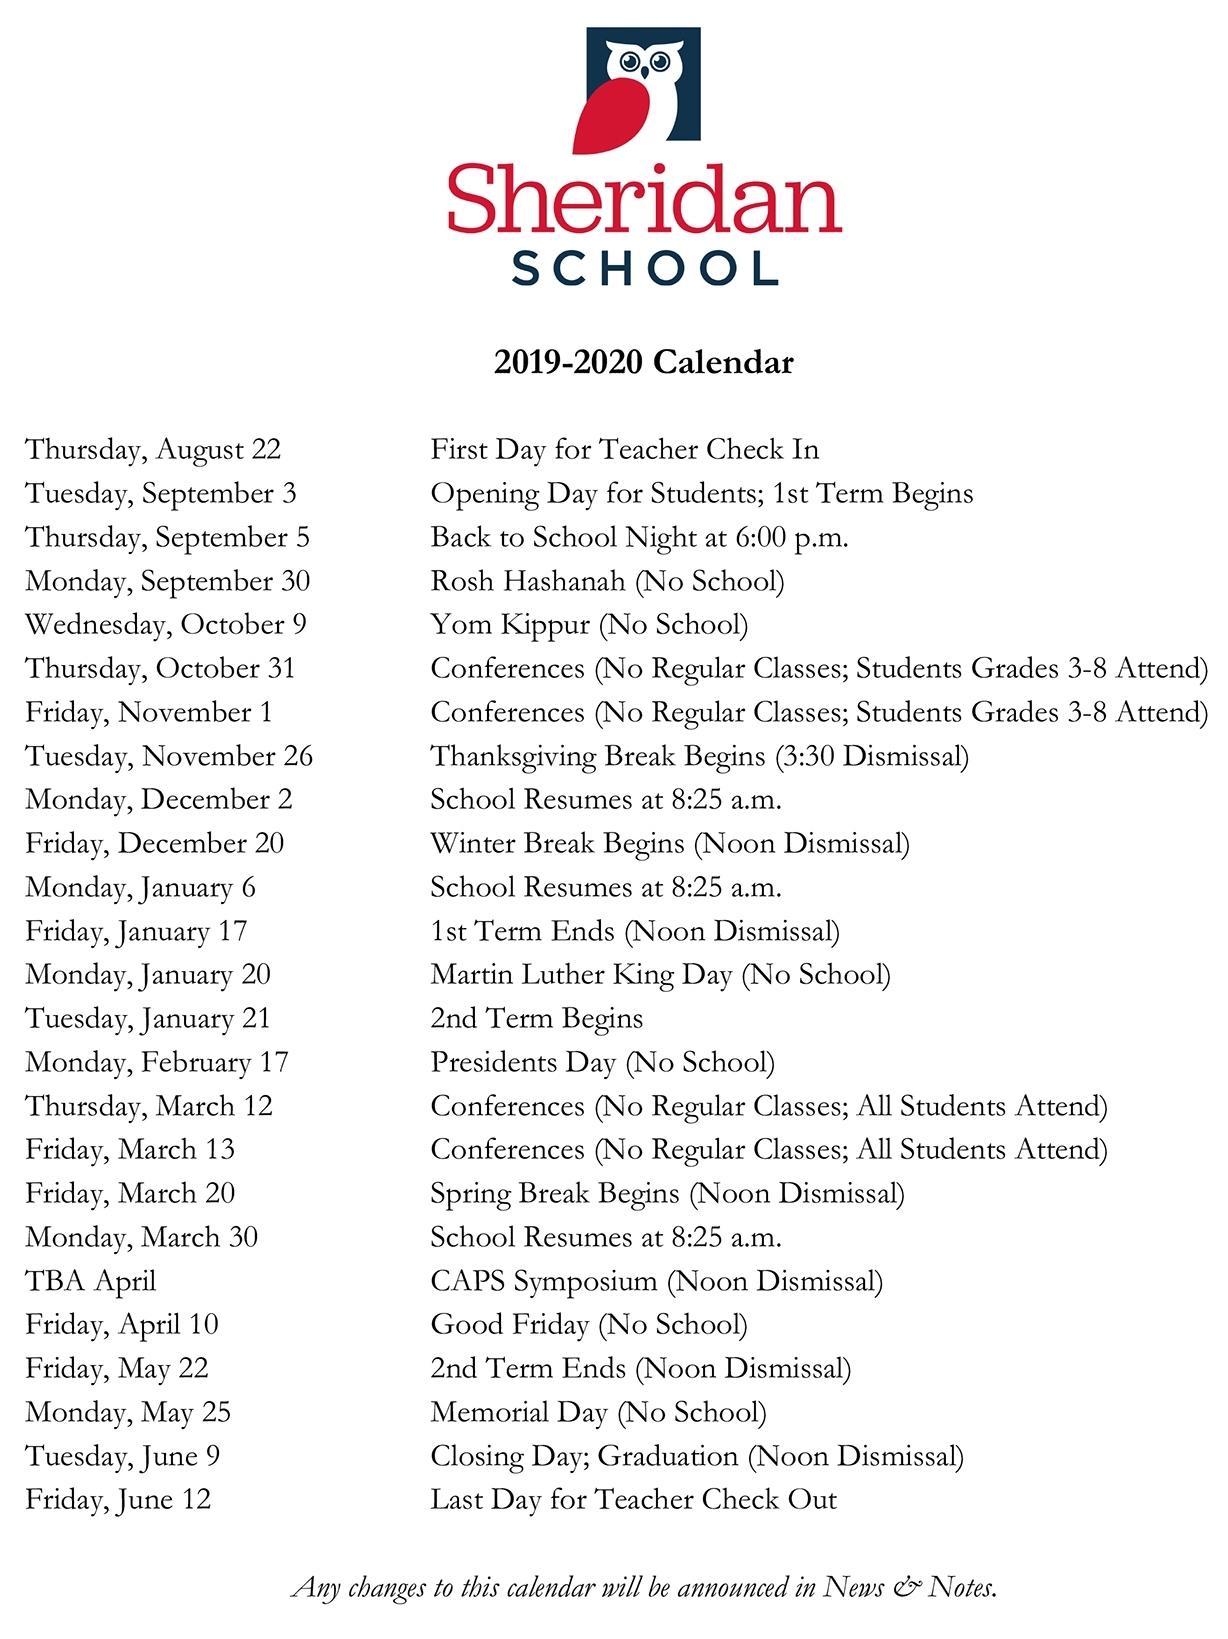 2019-2020 Calendar - Sheridan School November 3 2020 Calendar